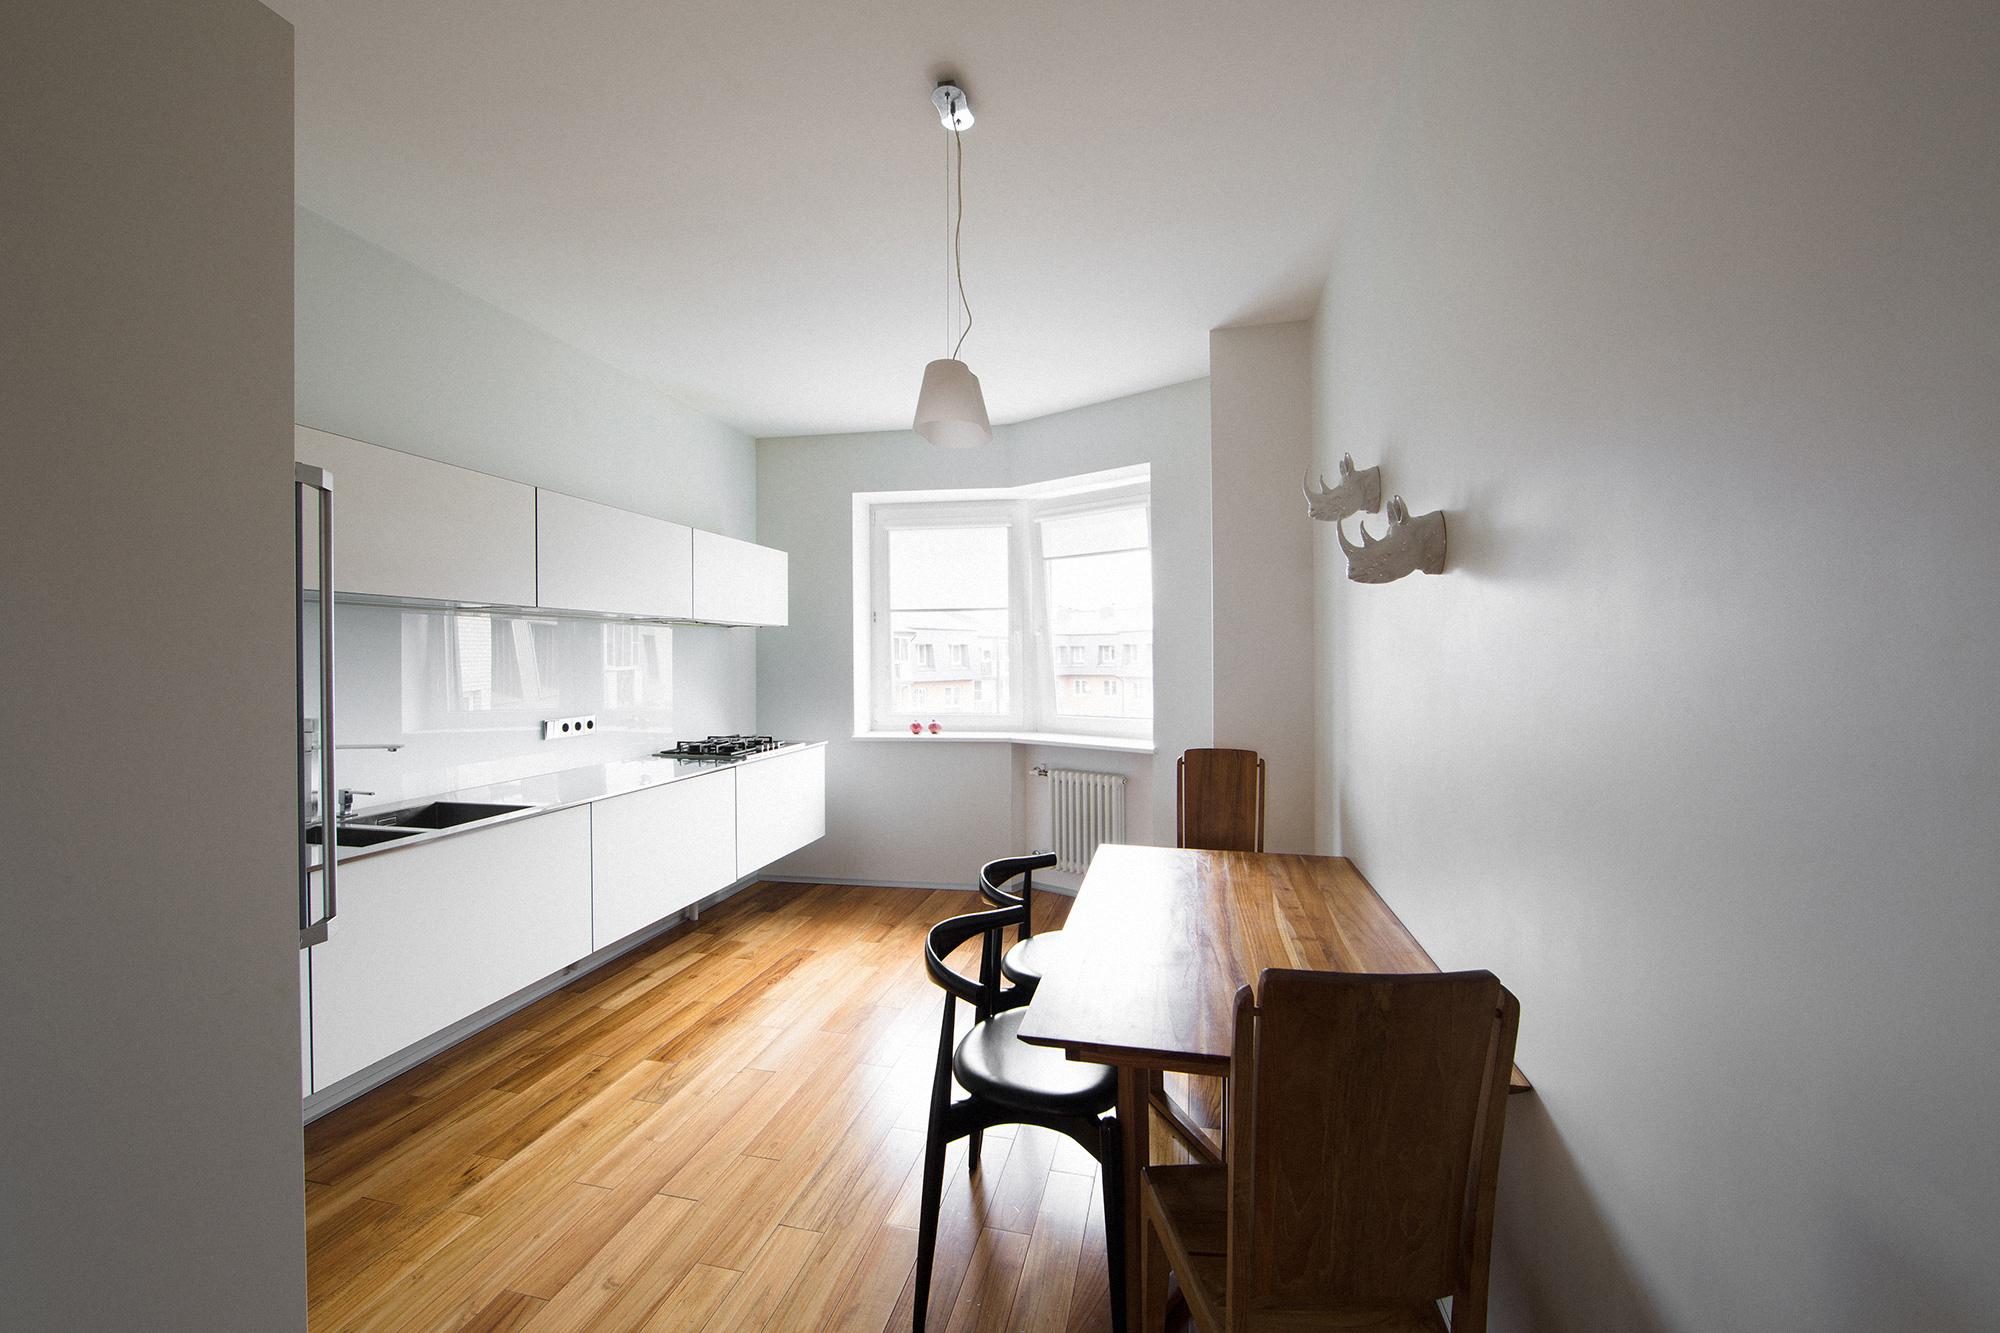 Интерьерная съемка квартиры